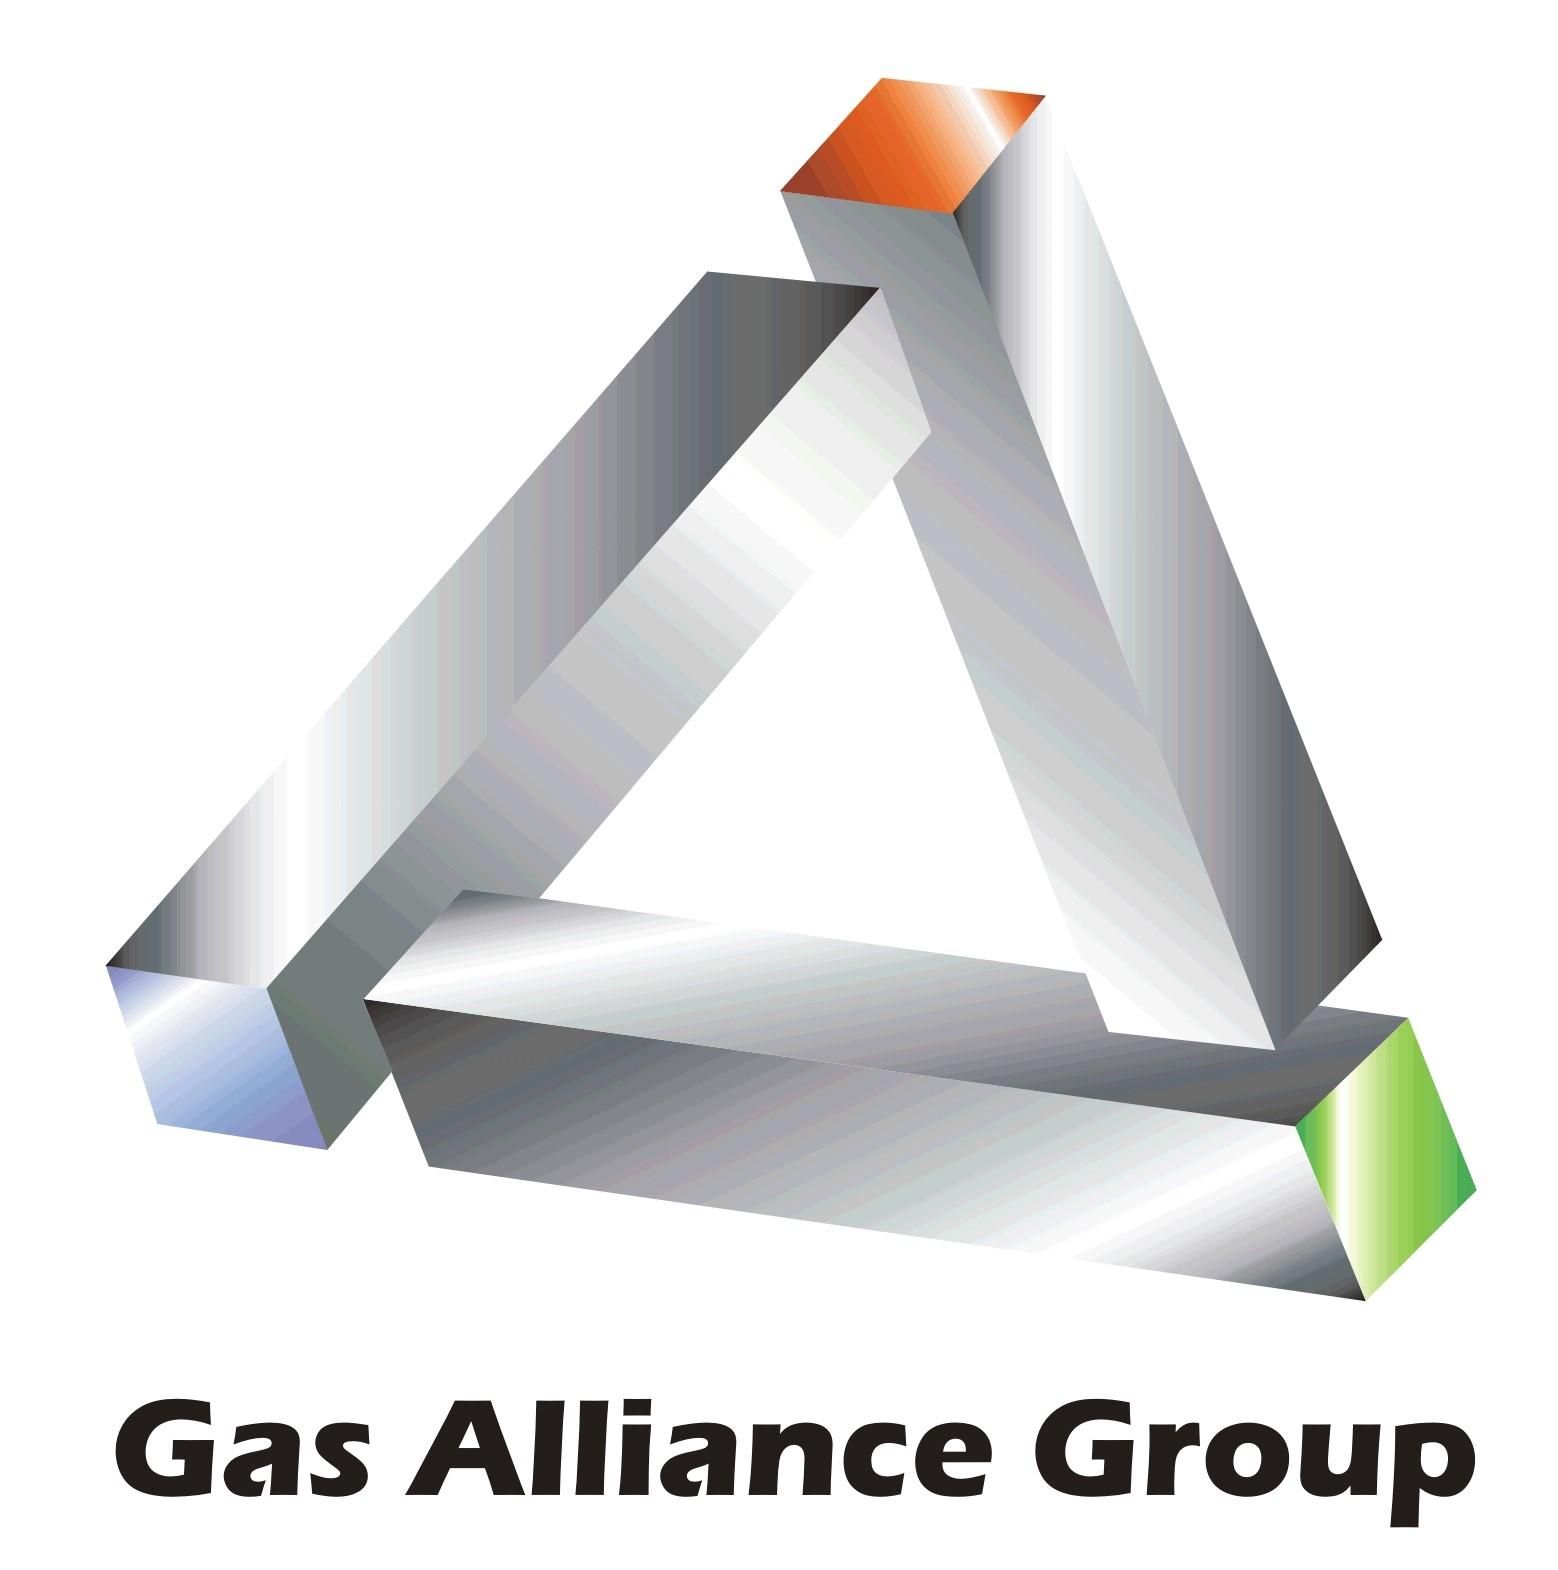 Gas Alliance company logo